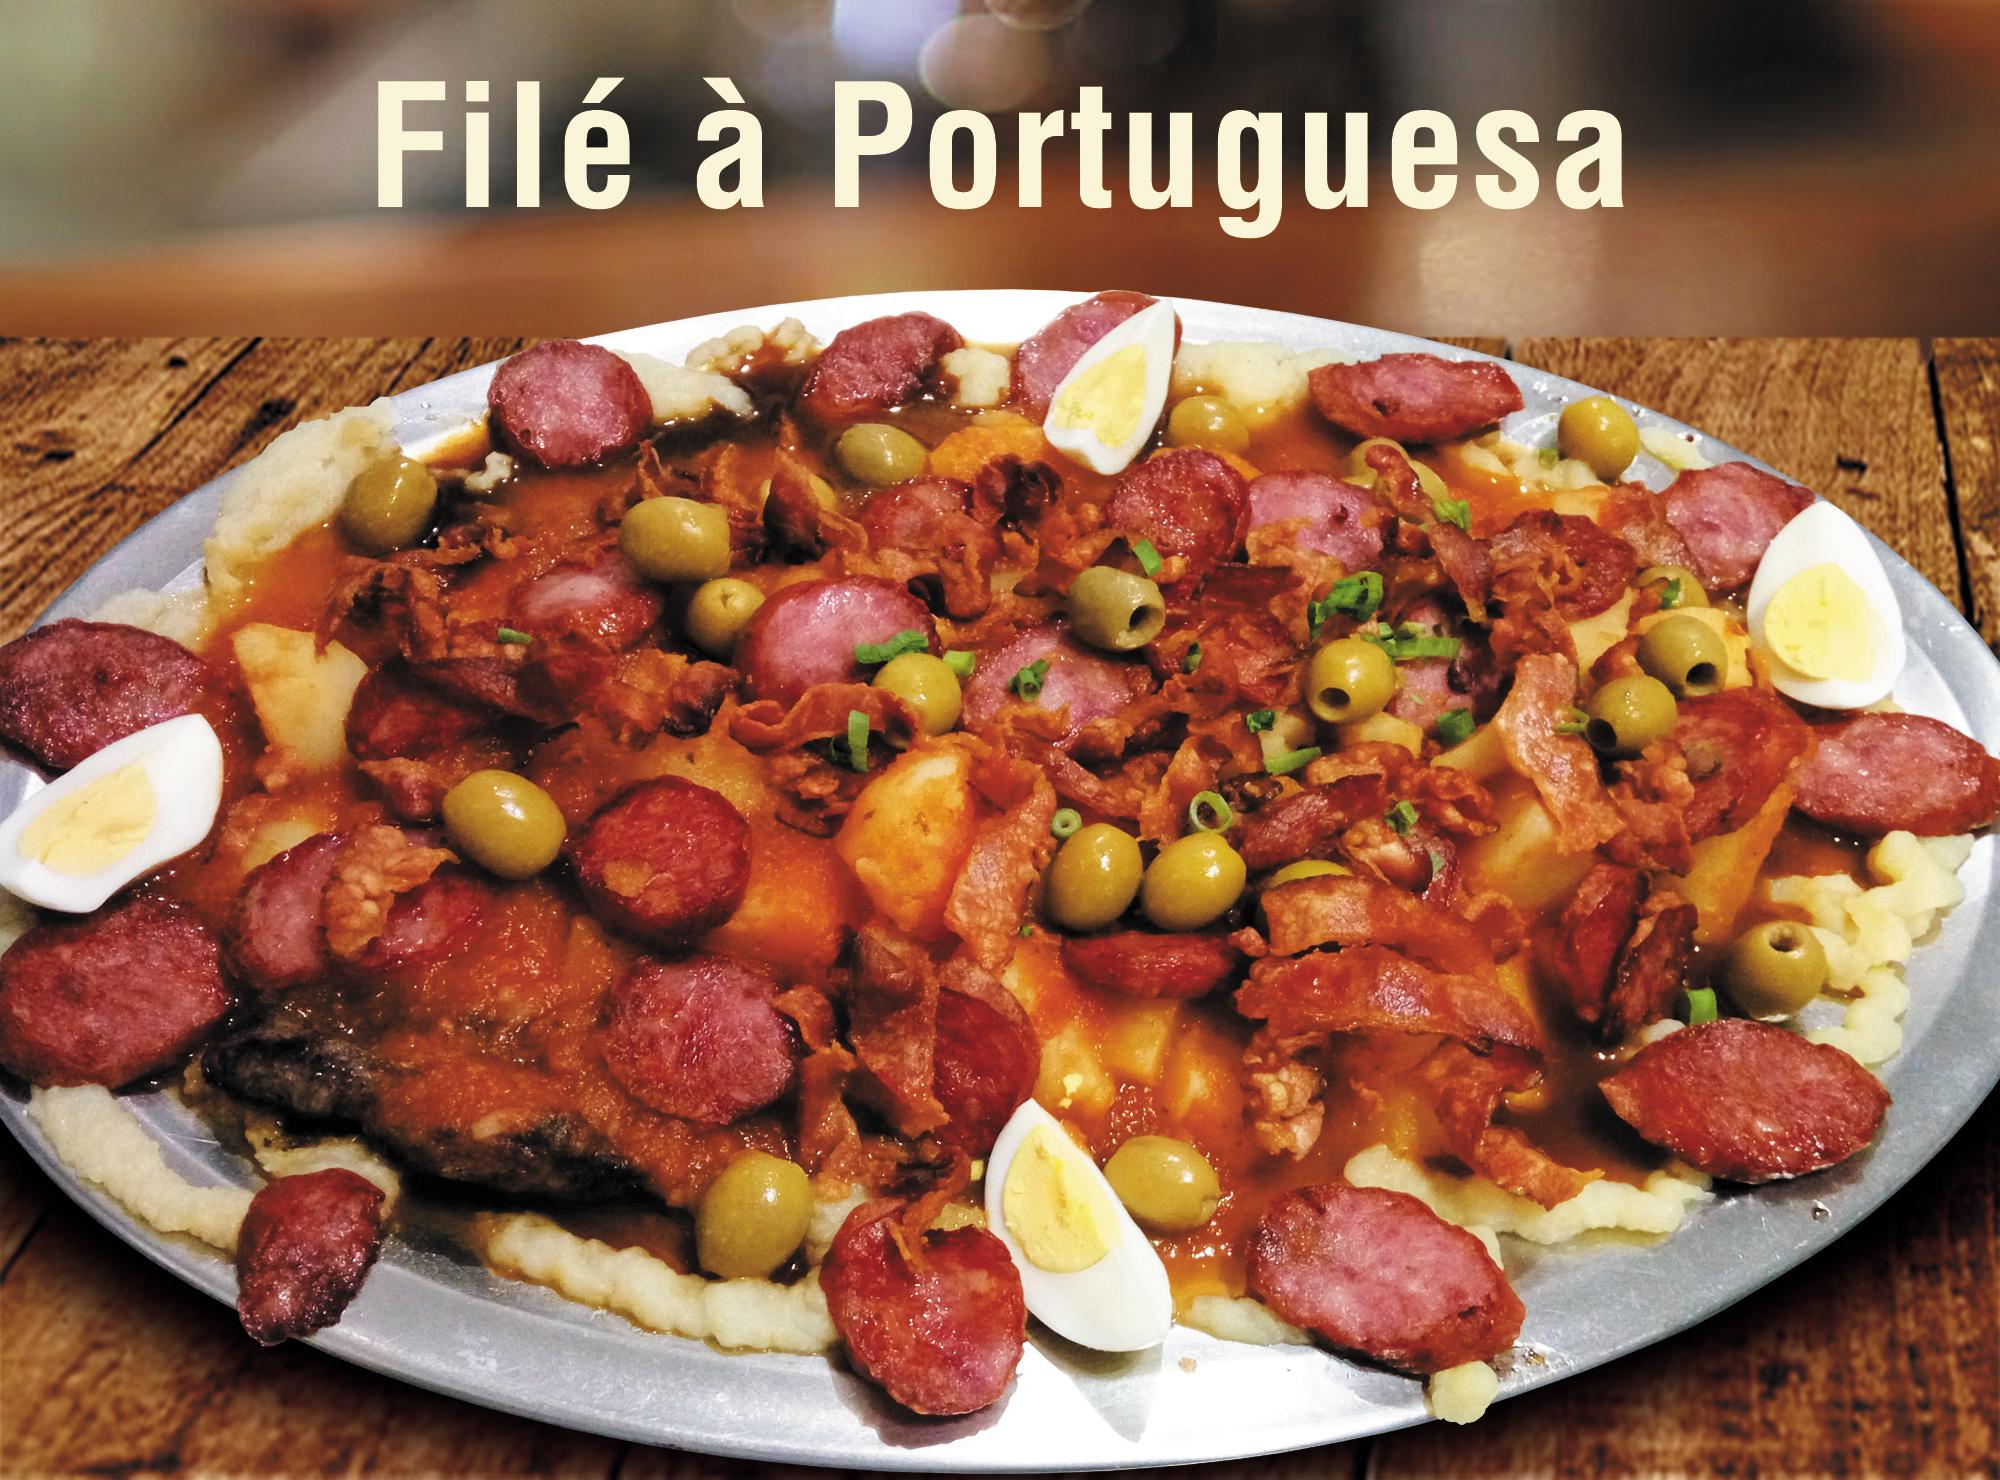 filé_a_portuguesa - Churrascaria